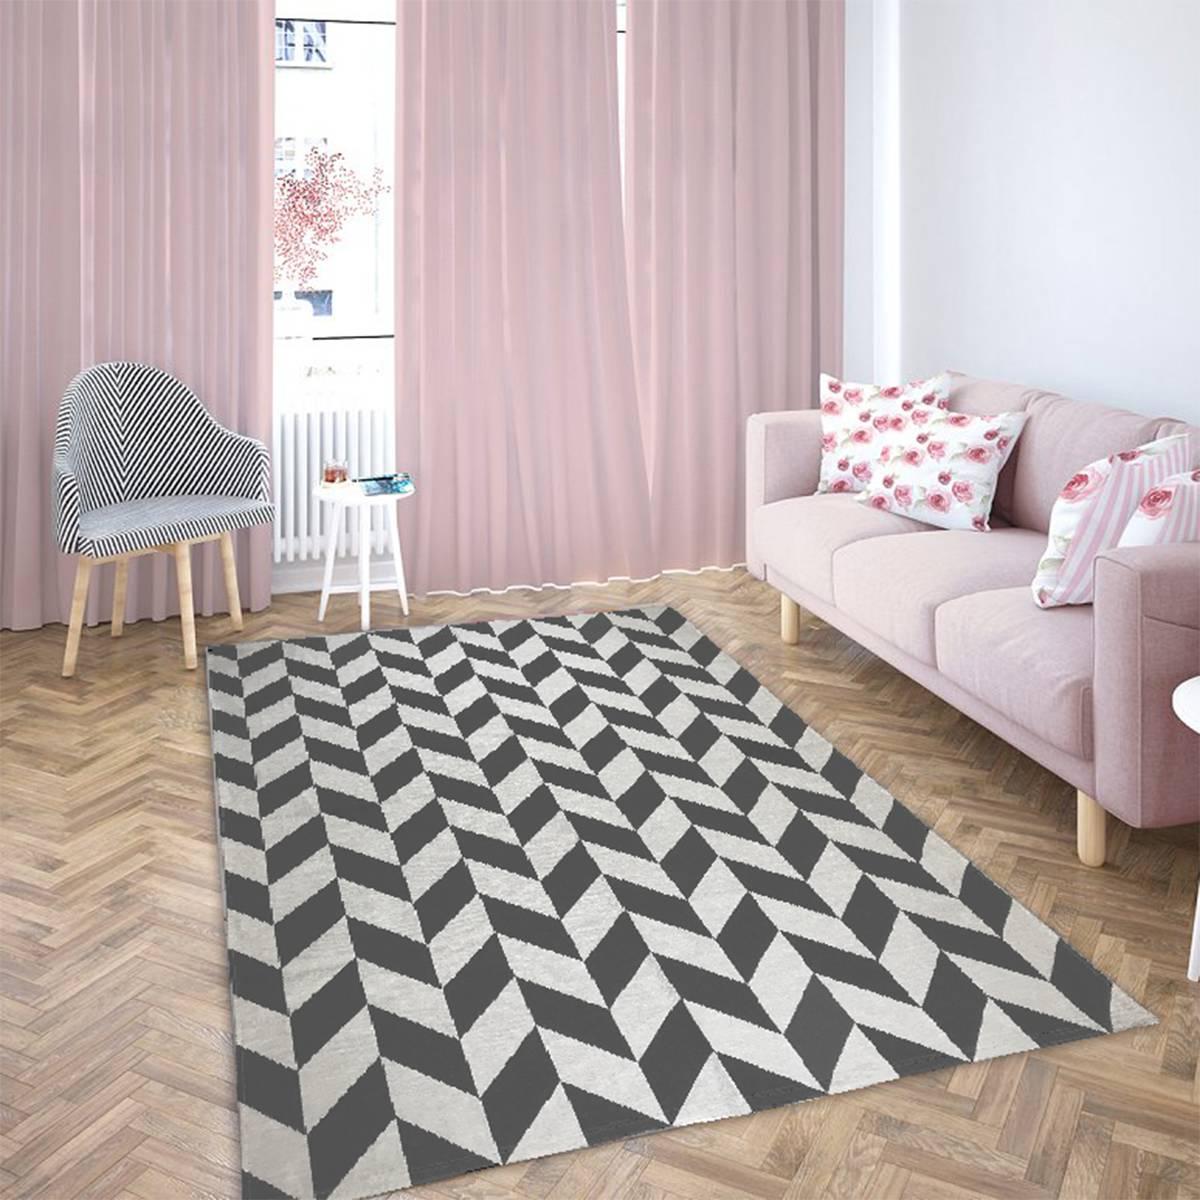 Tapete Geometrico para Sala Turim Cru com Cinza - 250x132